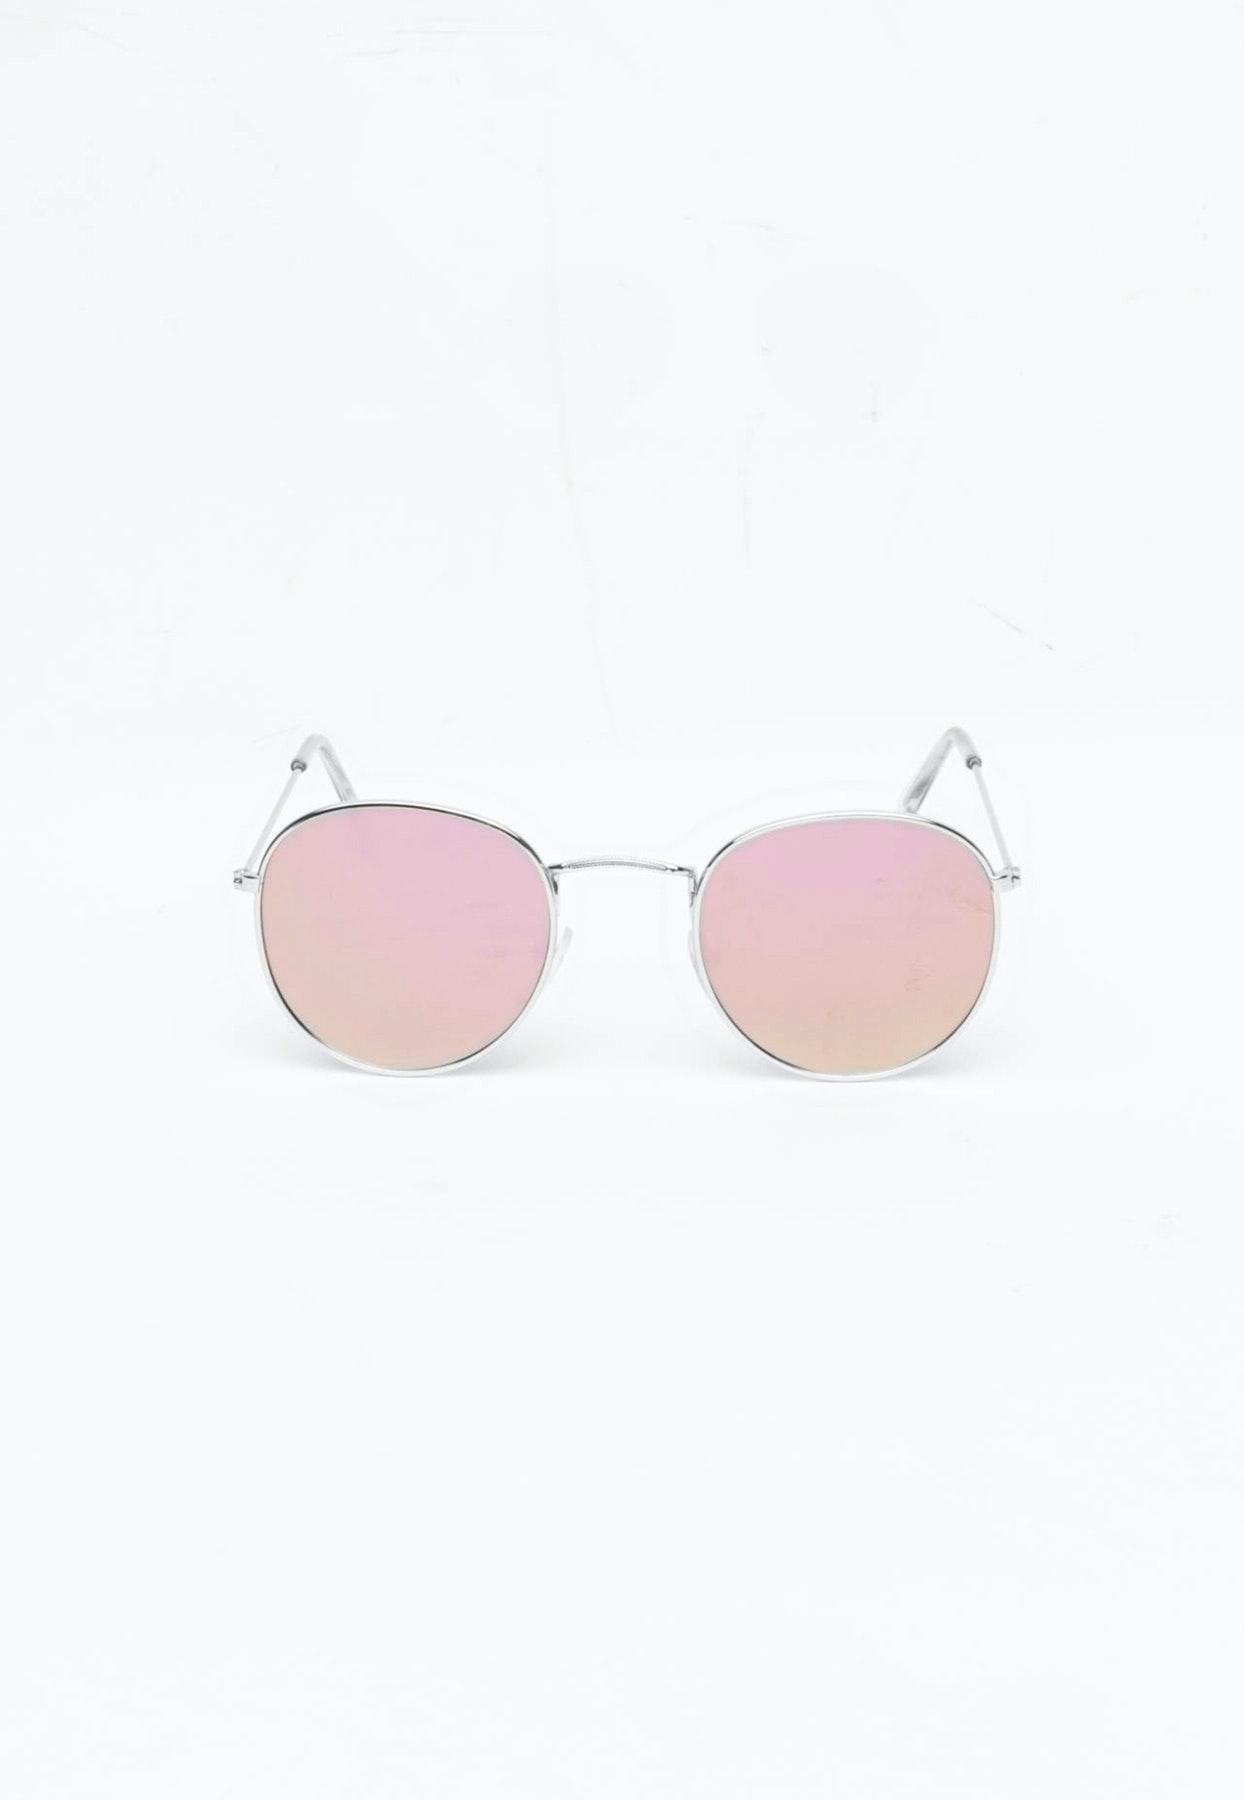 Retro Round - Silver Frame/ Pink